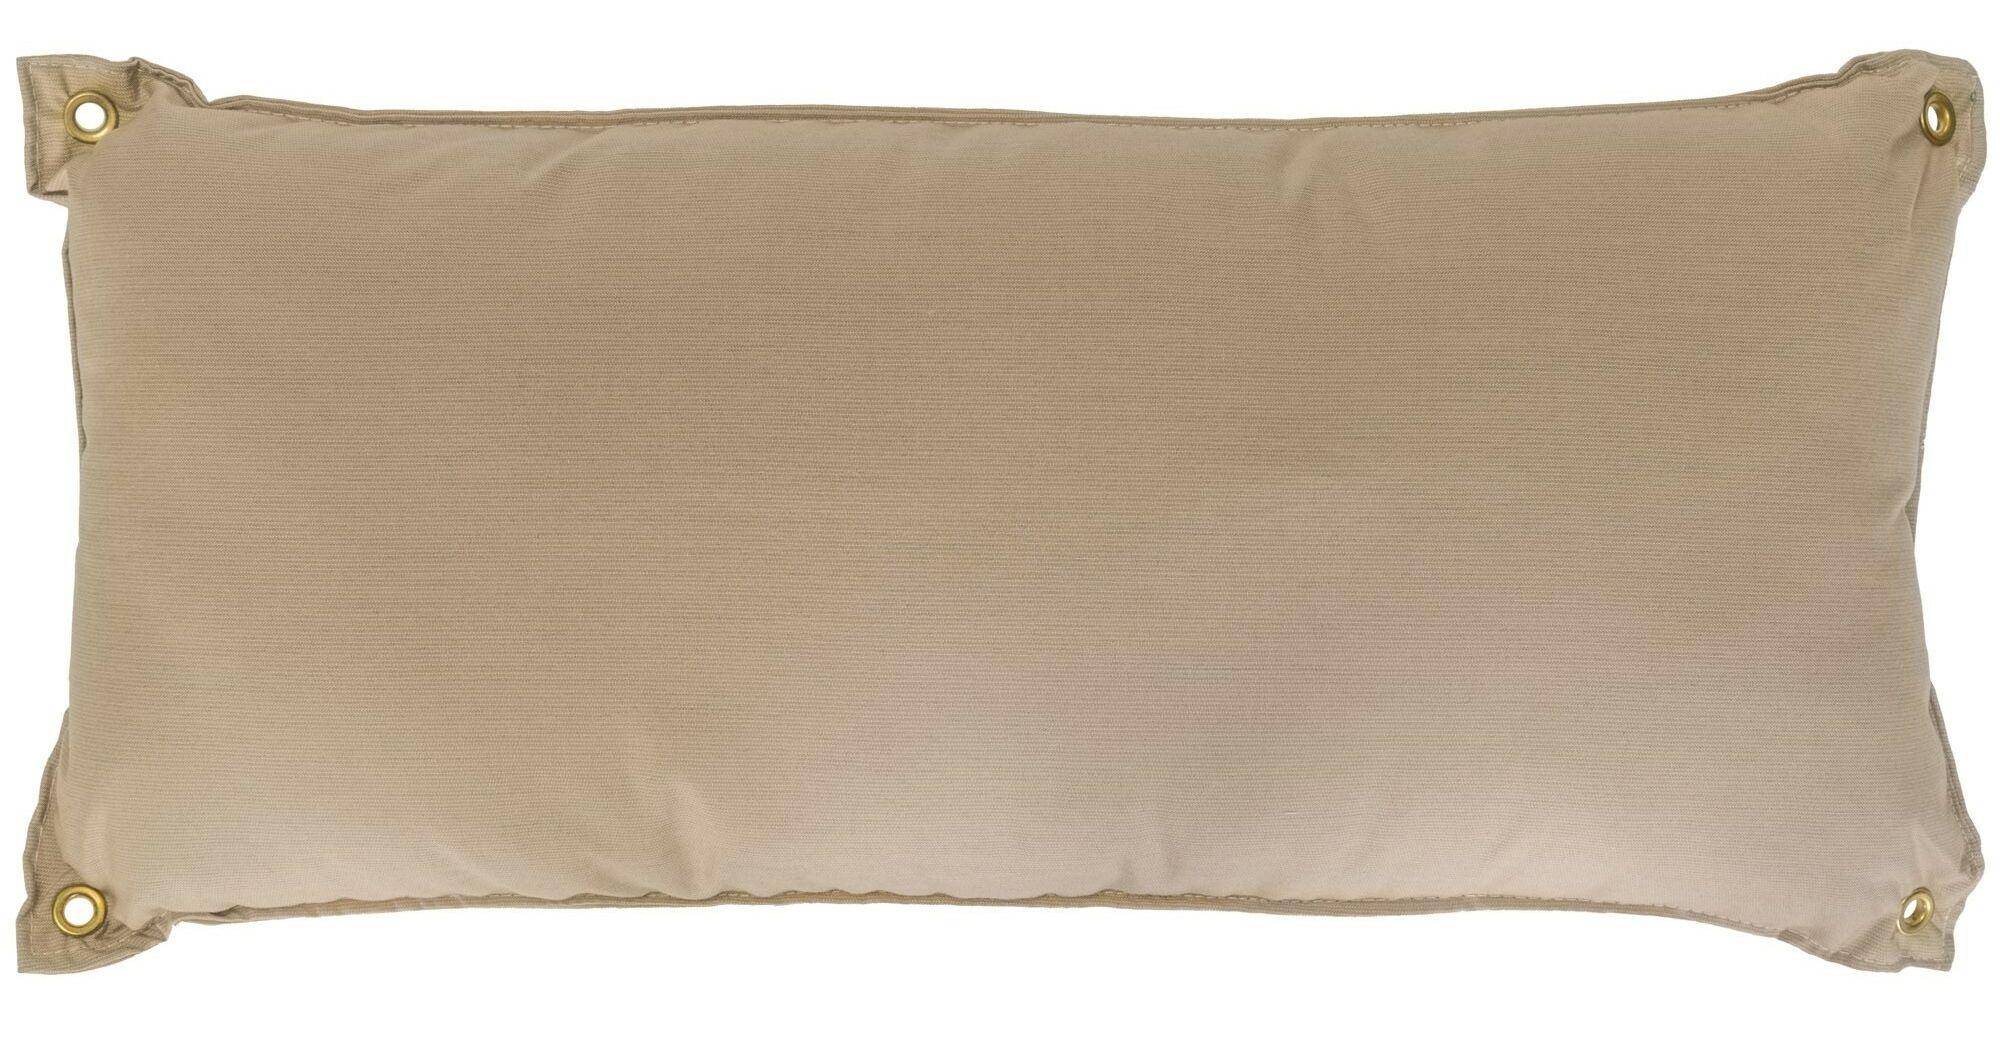 Edney Traditional Hammock Pillow Color: Spectrum Sand